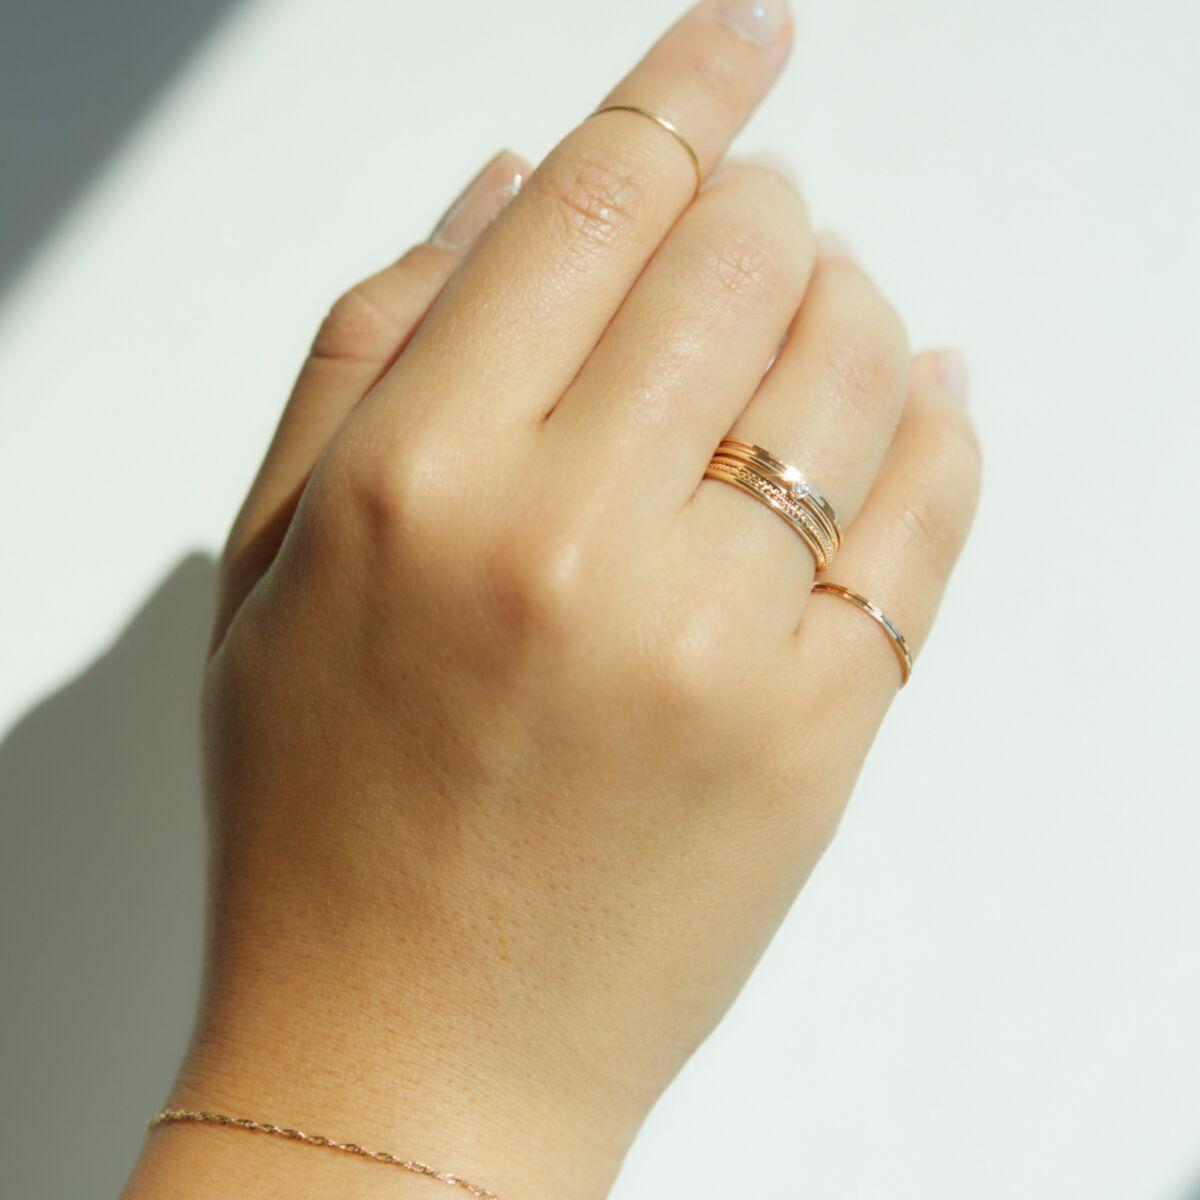 Little Lift Diamond Stacking Ring image